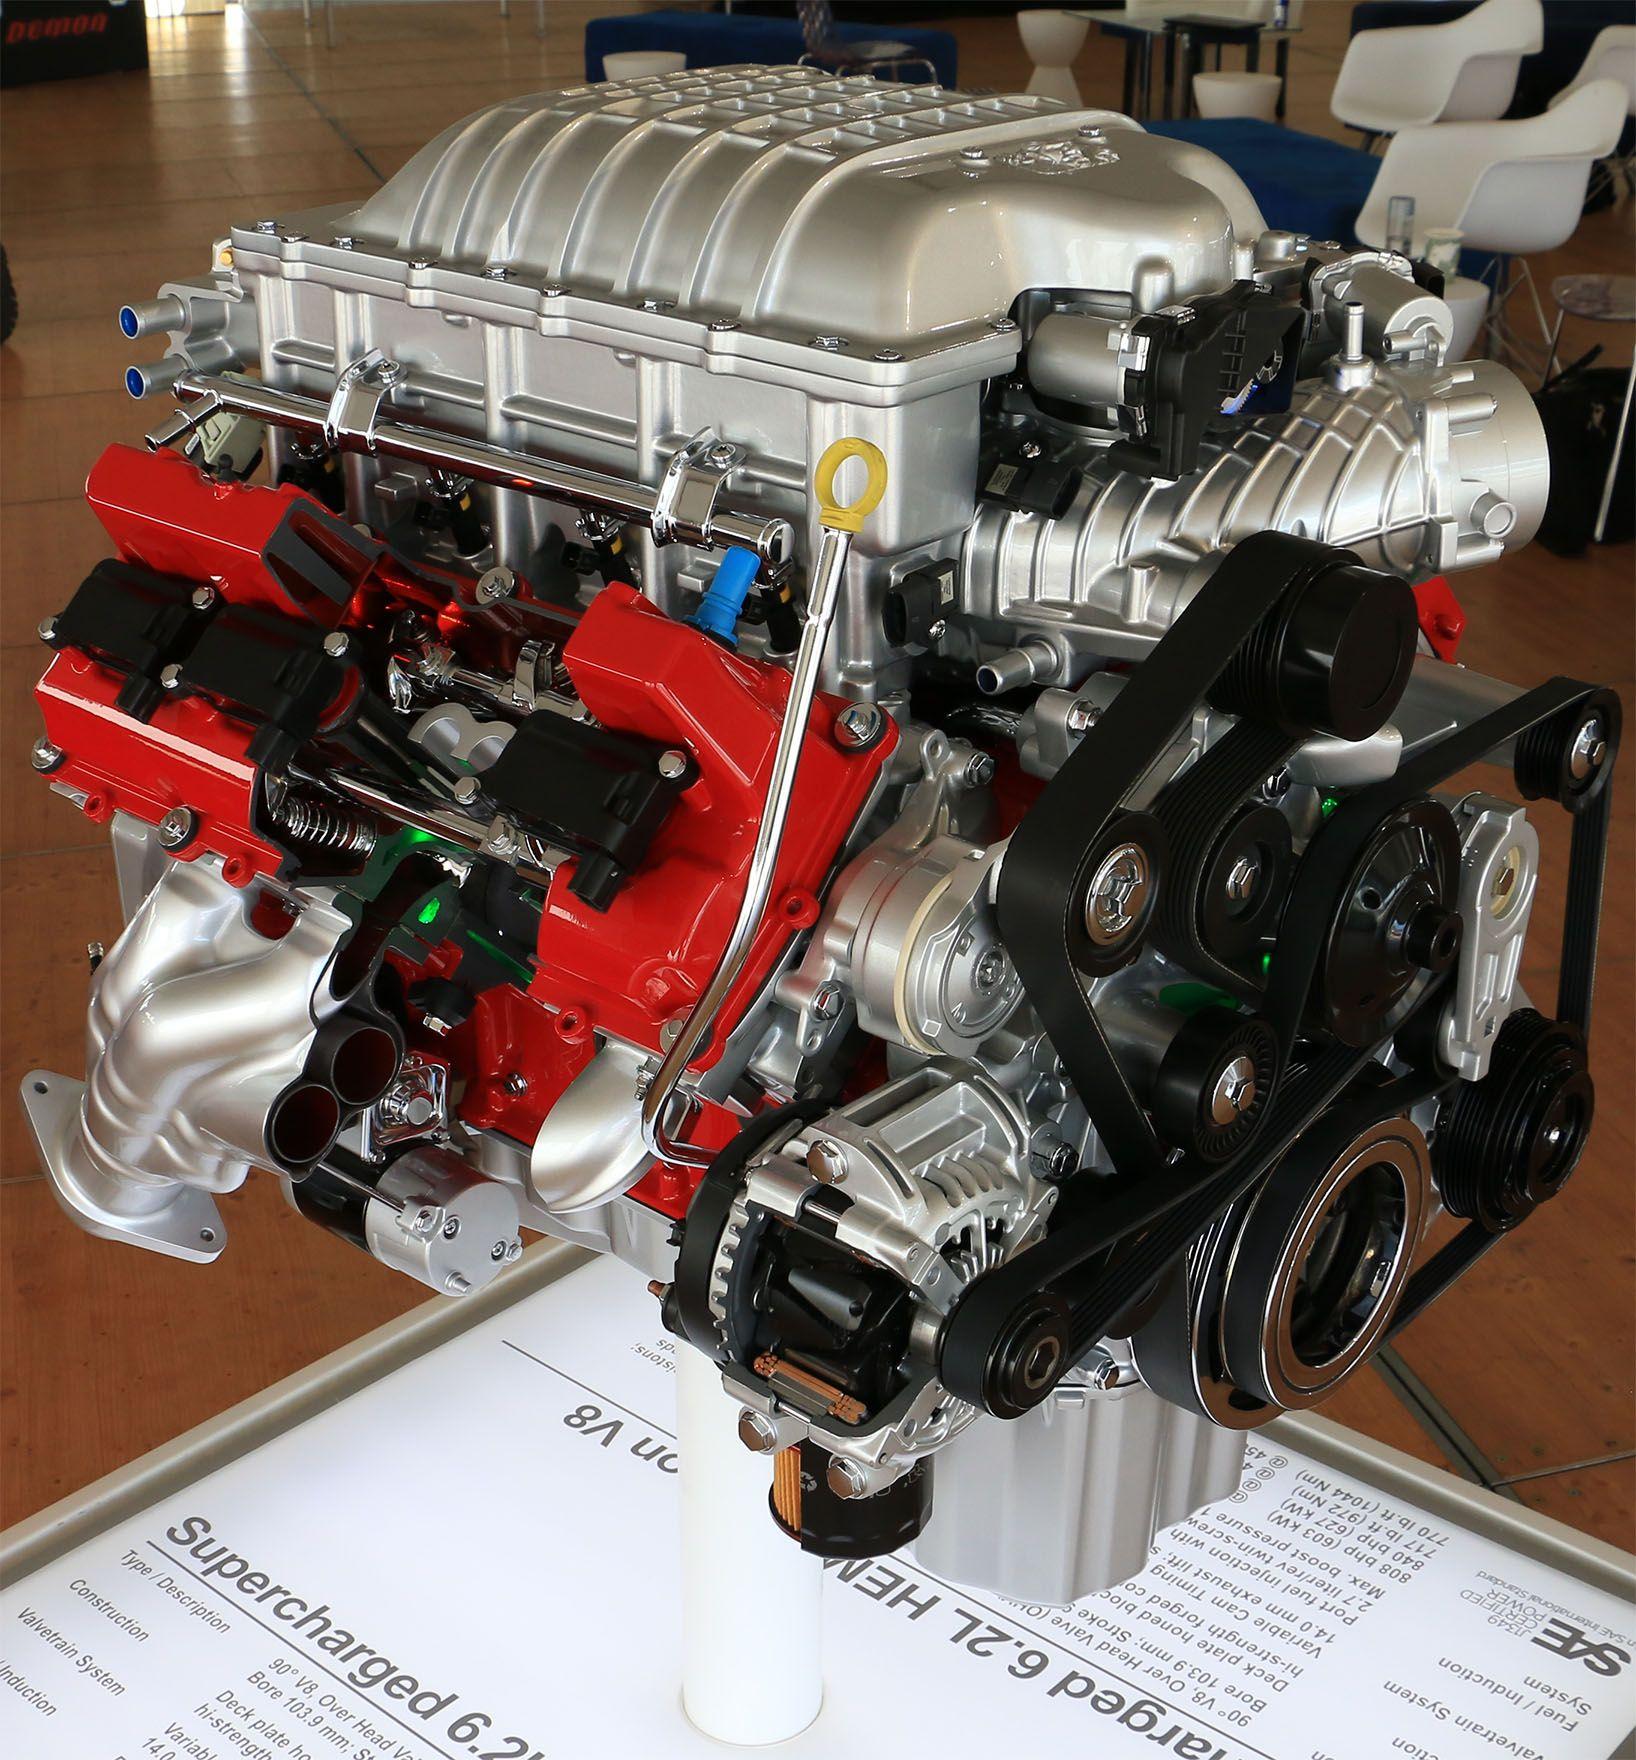 Flying High Dodge Challenger Srt8: 2018 Dodge Demon Engine 840 HP With High Octane Racing